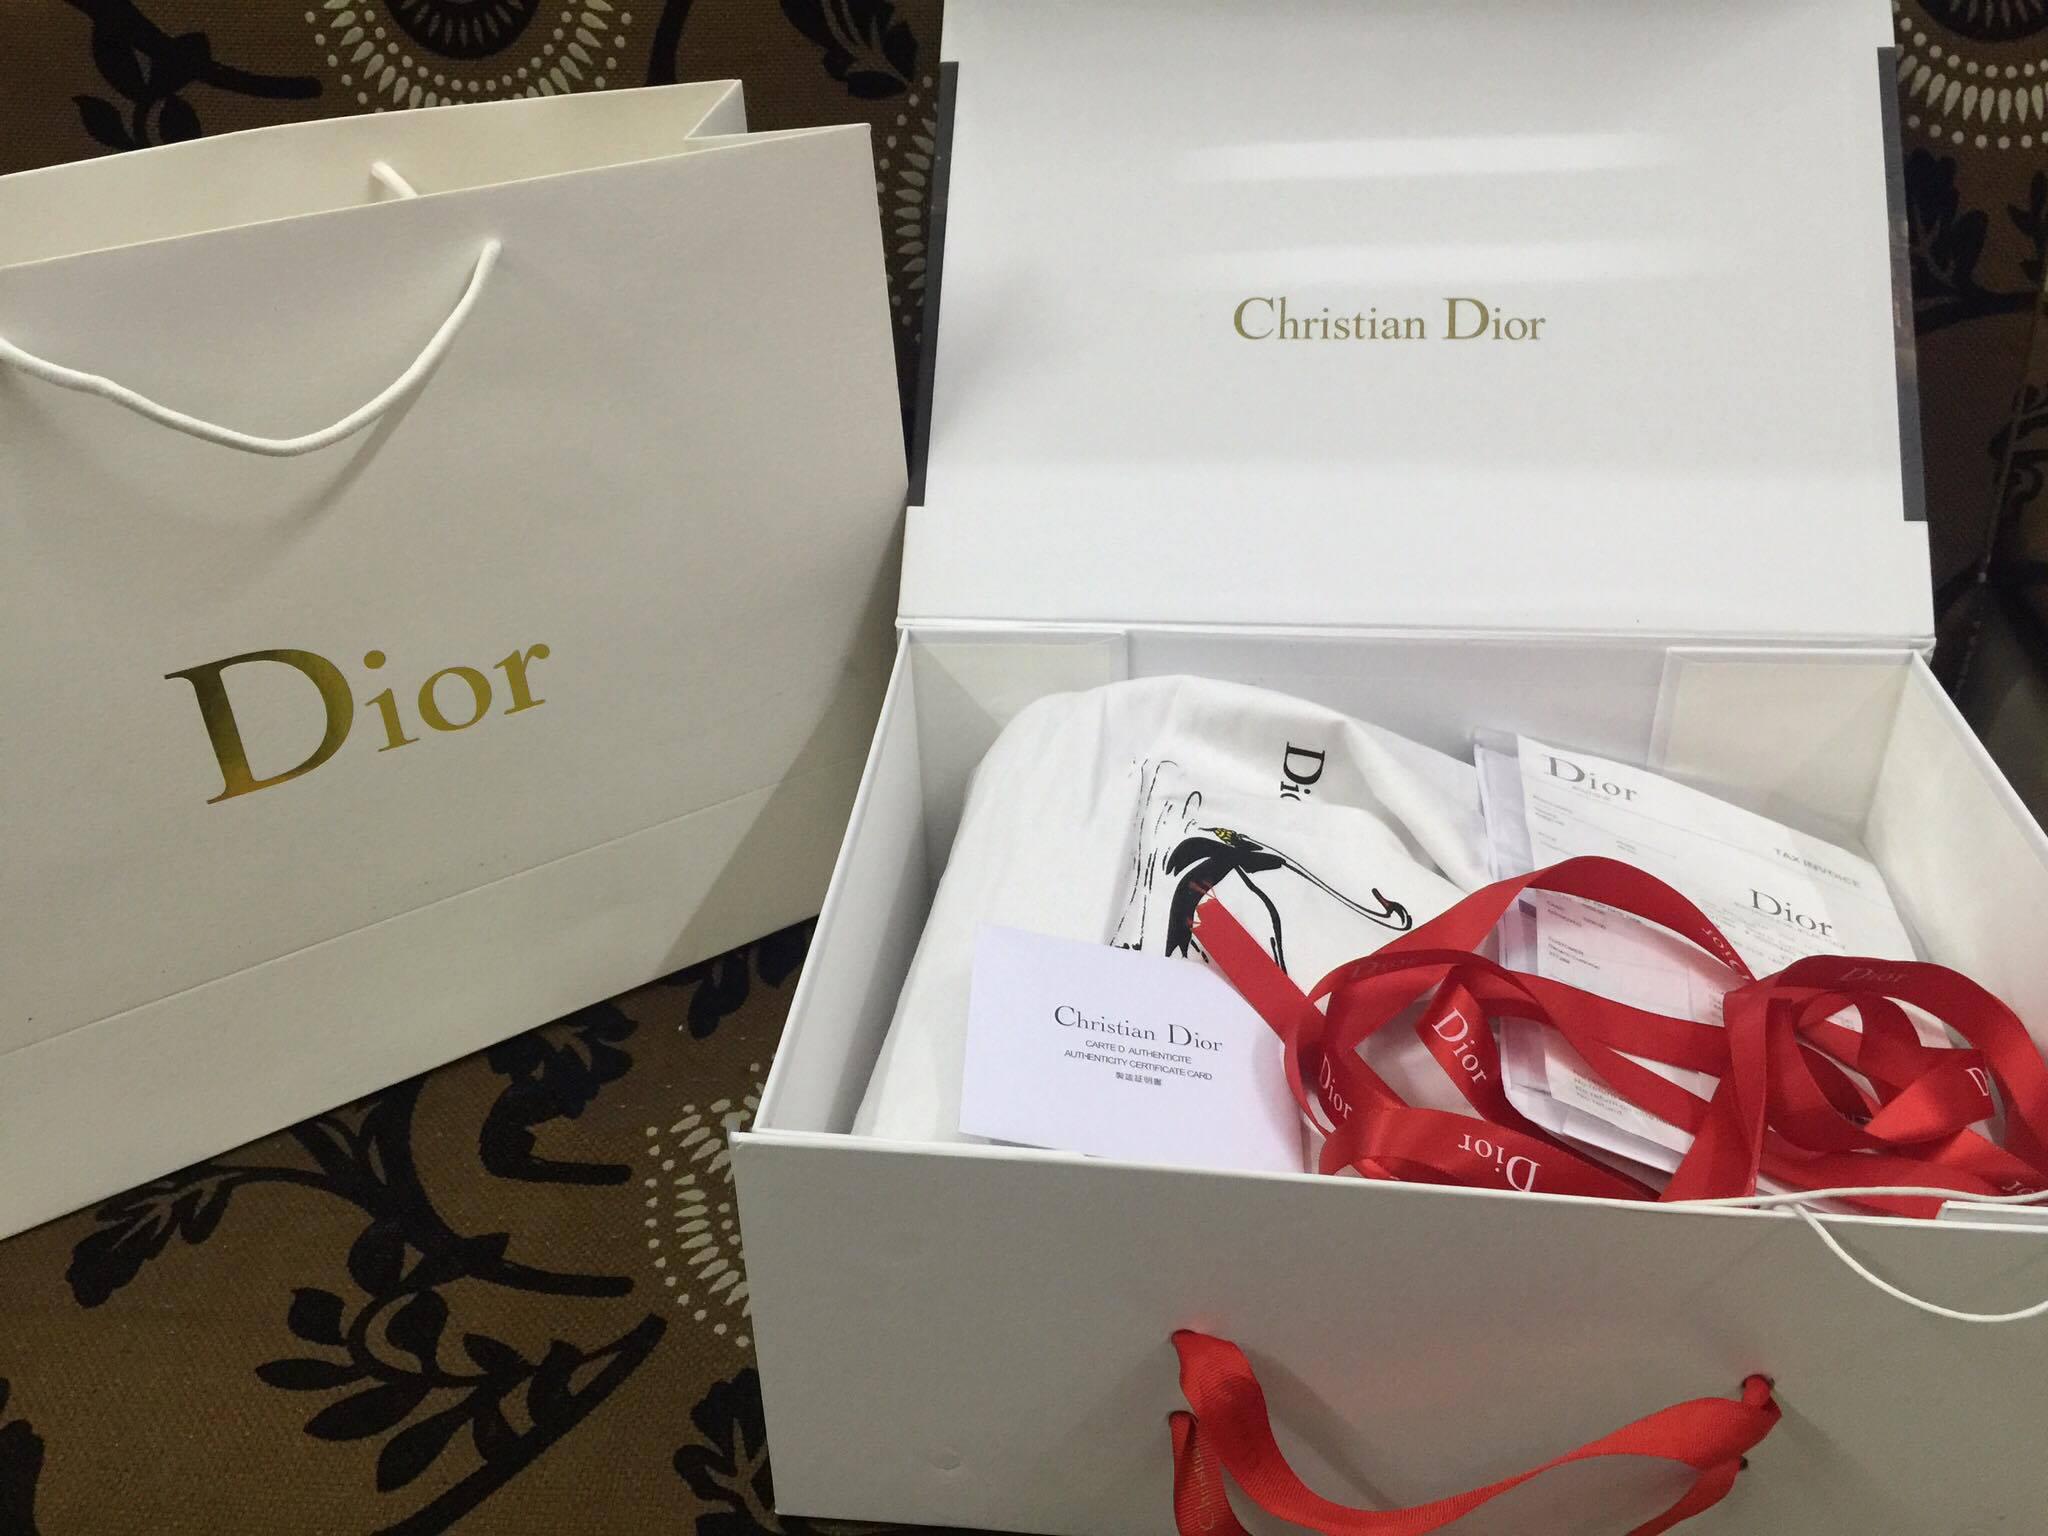 Túi giấy Dior cao cấp cho shop thời trang